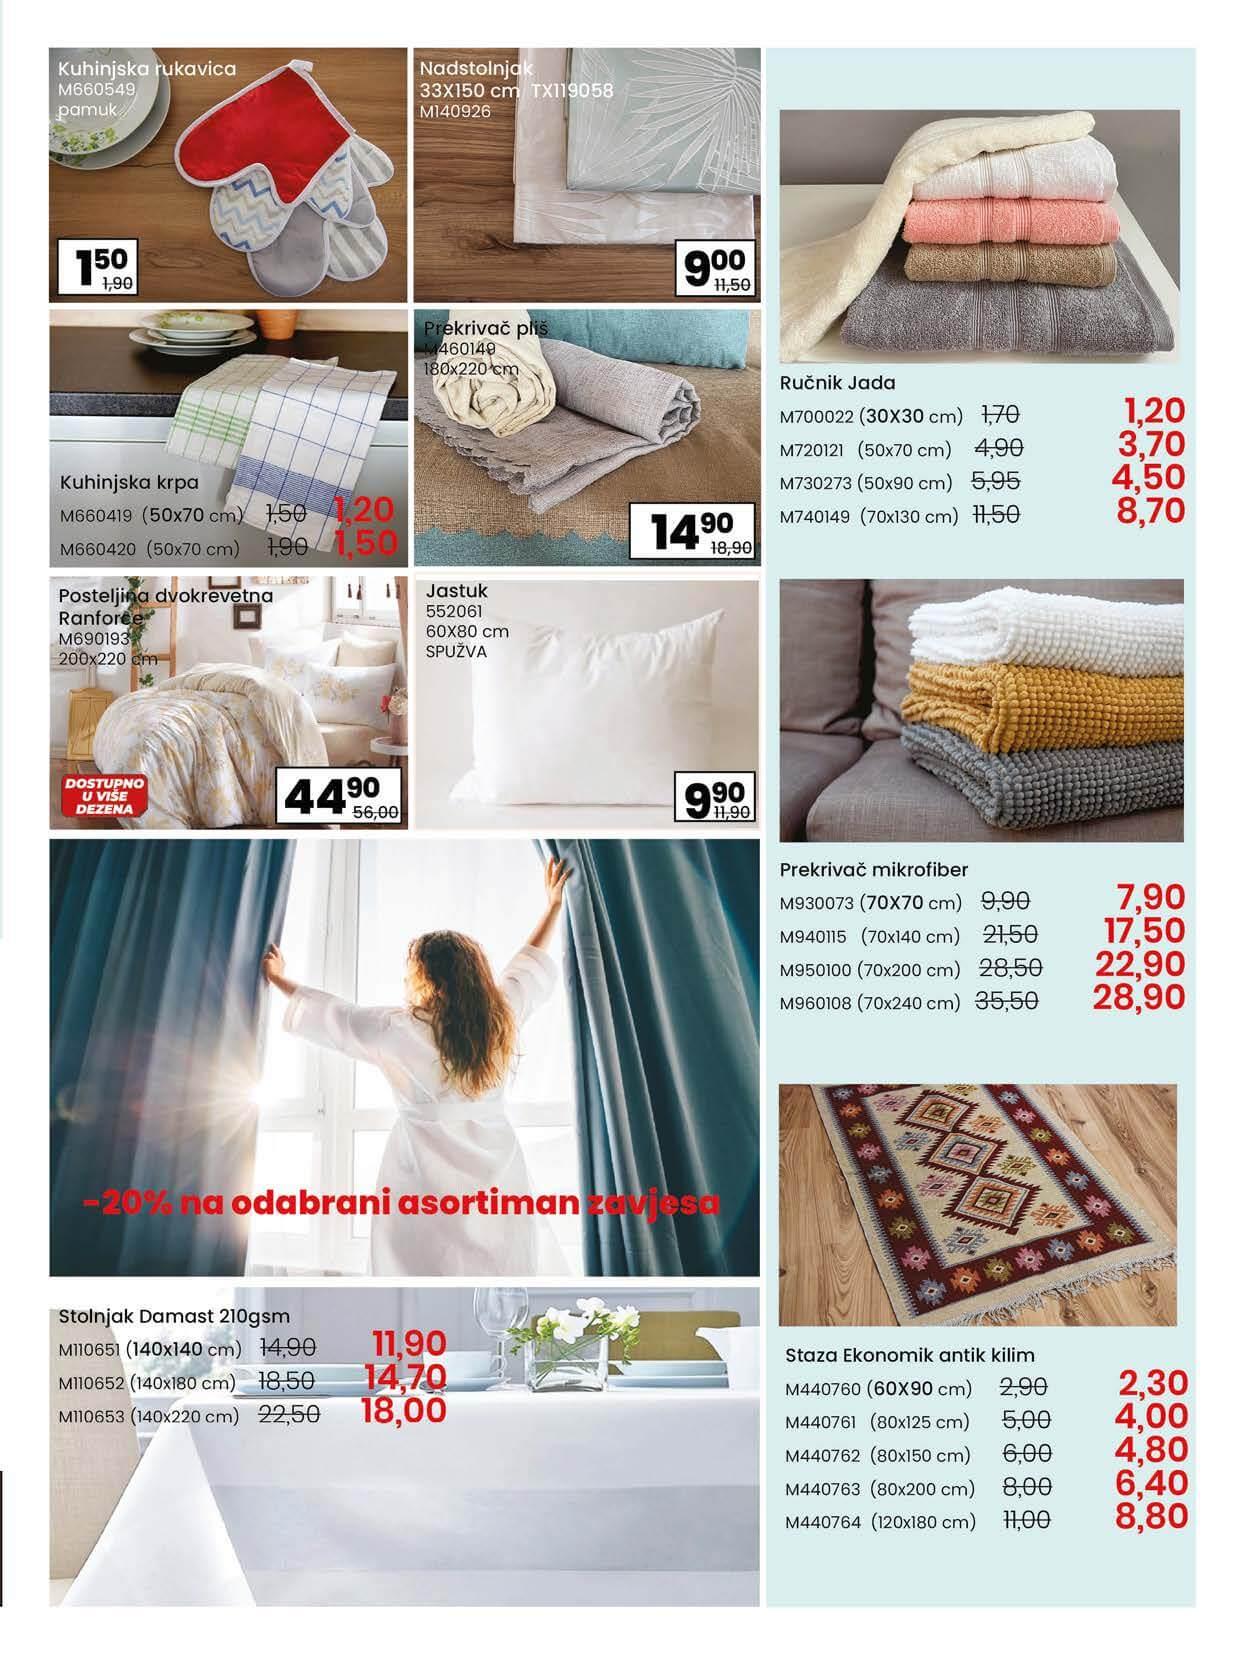 FISov Katalog Akcijski Katalog JUL AVG 2021 19.7.2021. 9.8.2021. Page 29